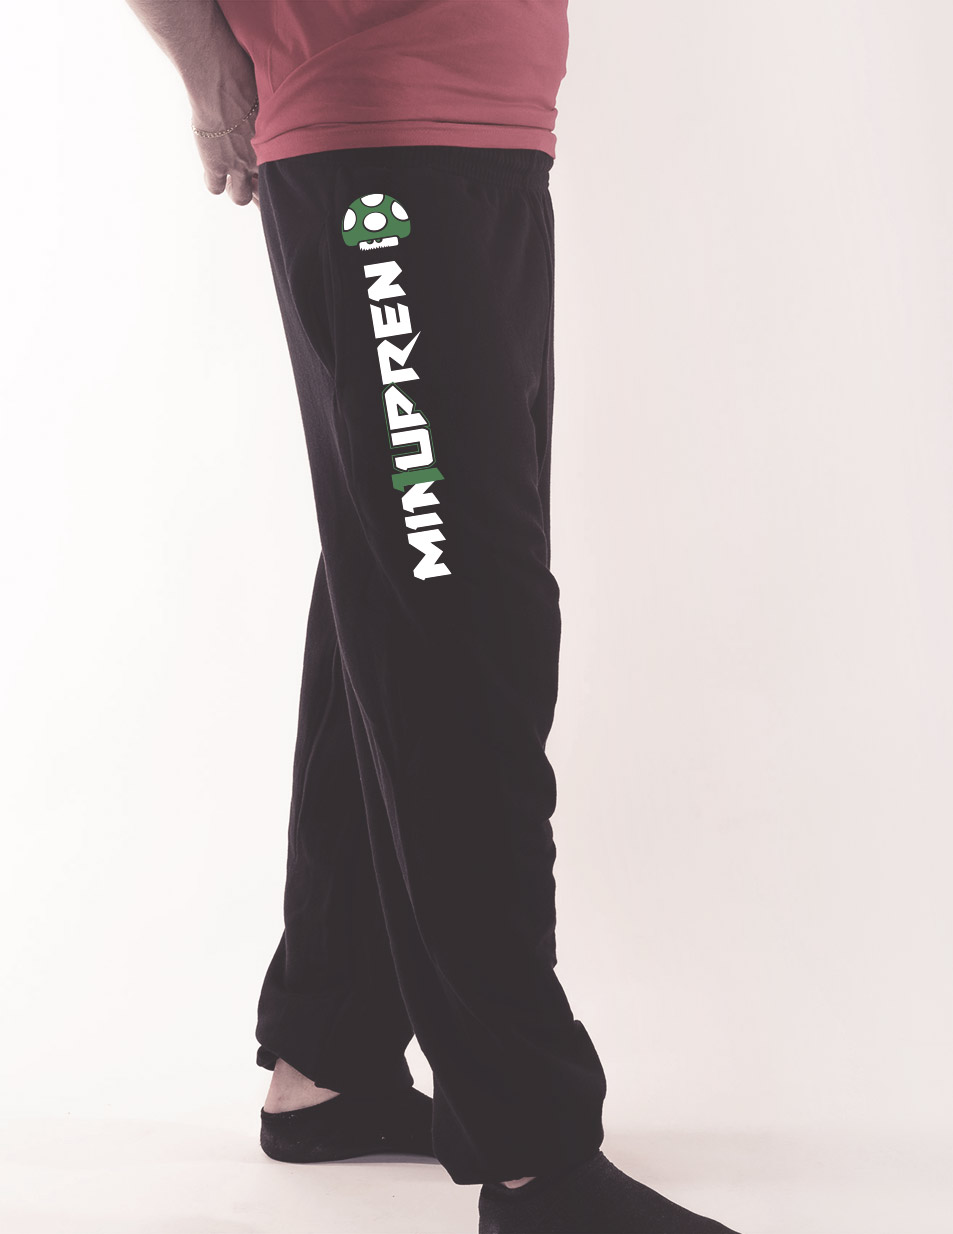 Herren-Jogginghose min1upren mehrfarbig auf schwarz